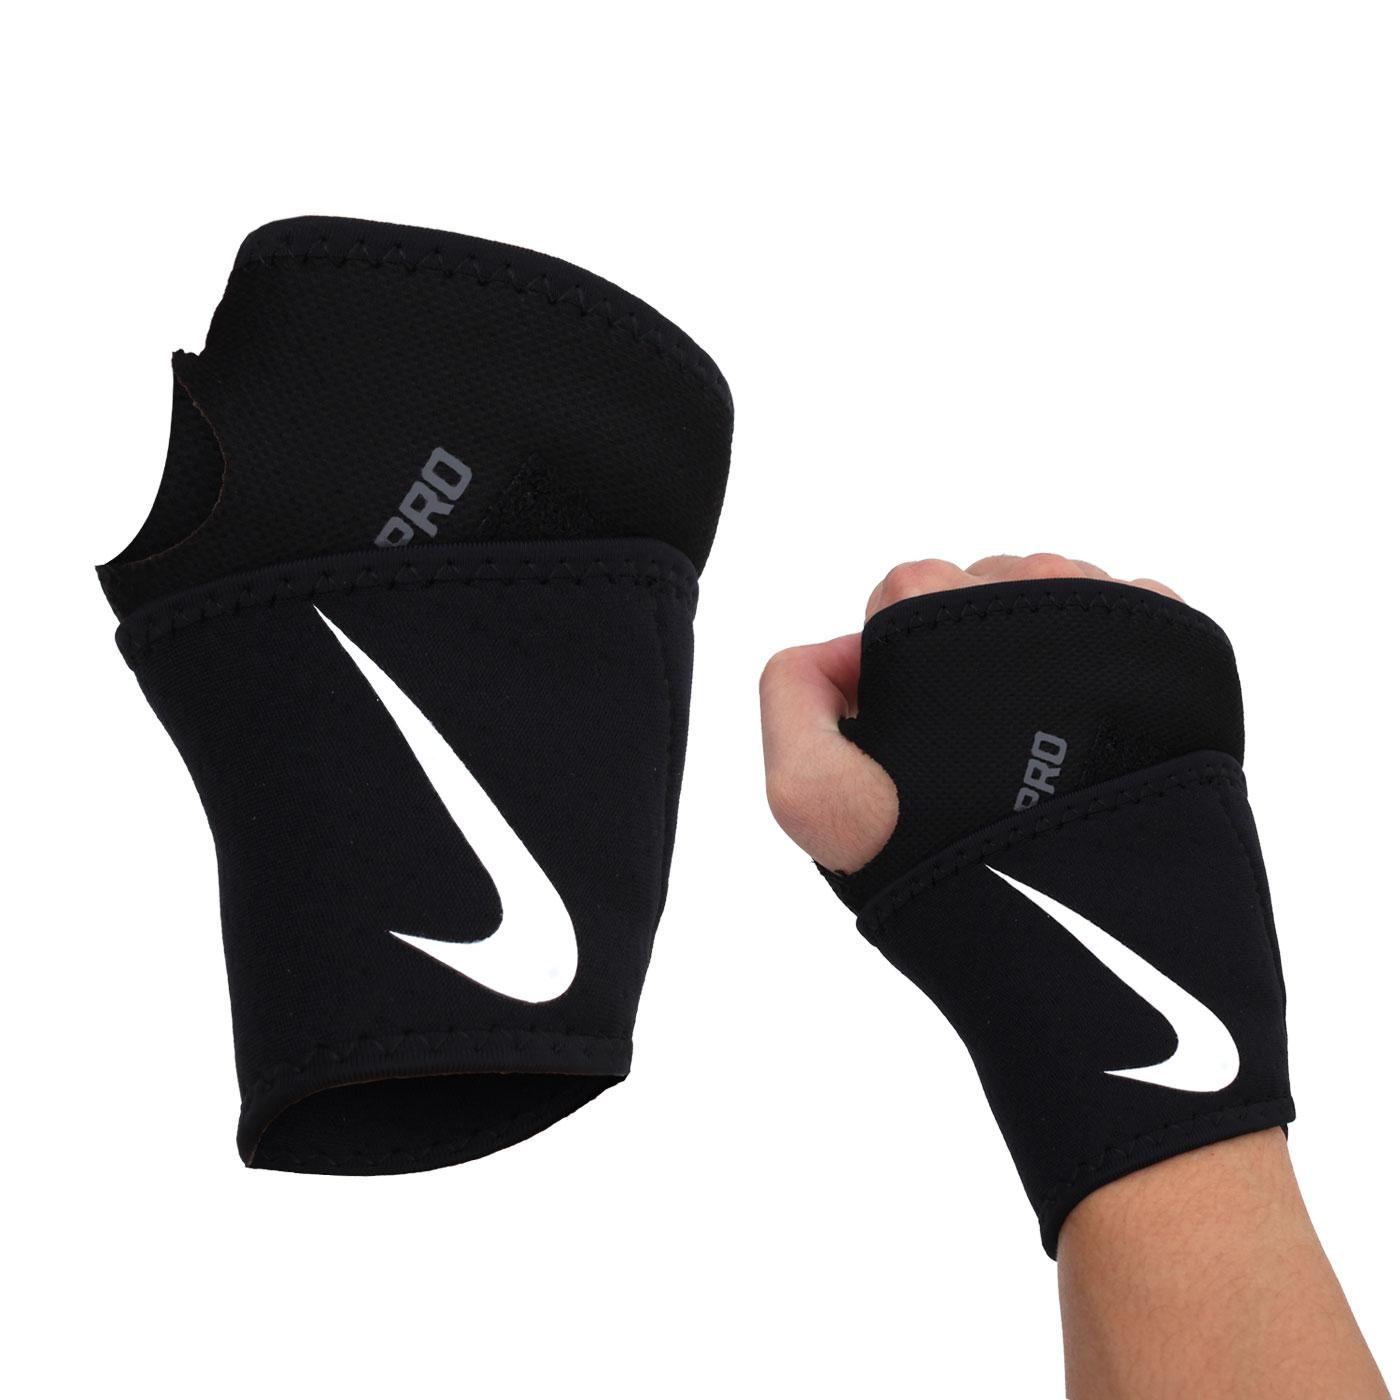 NIKE PRO 調節式護腕帶2.0(網球 羽毛球 高爾夫【94290320】≡排汗專家≡